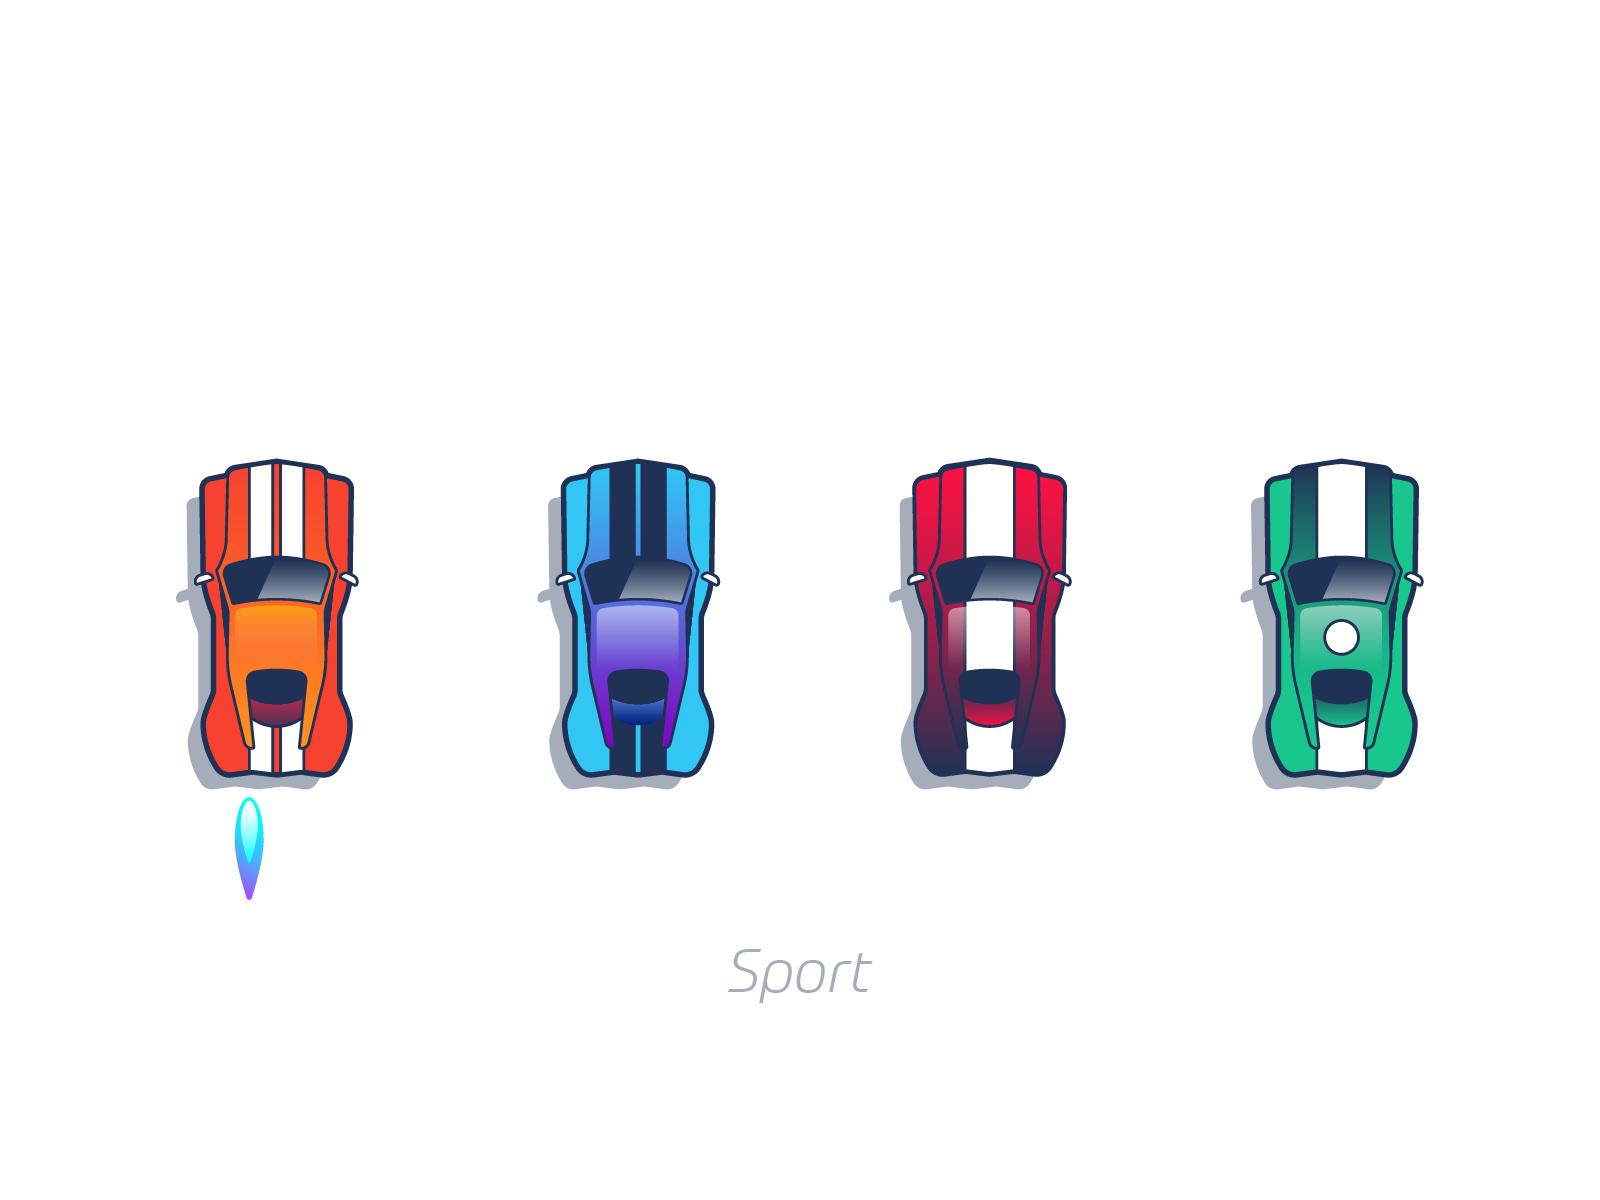 Sport cars mobile game design